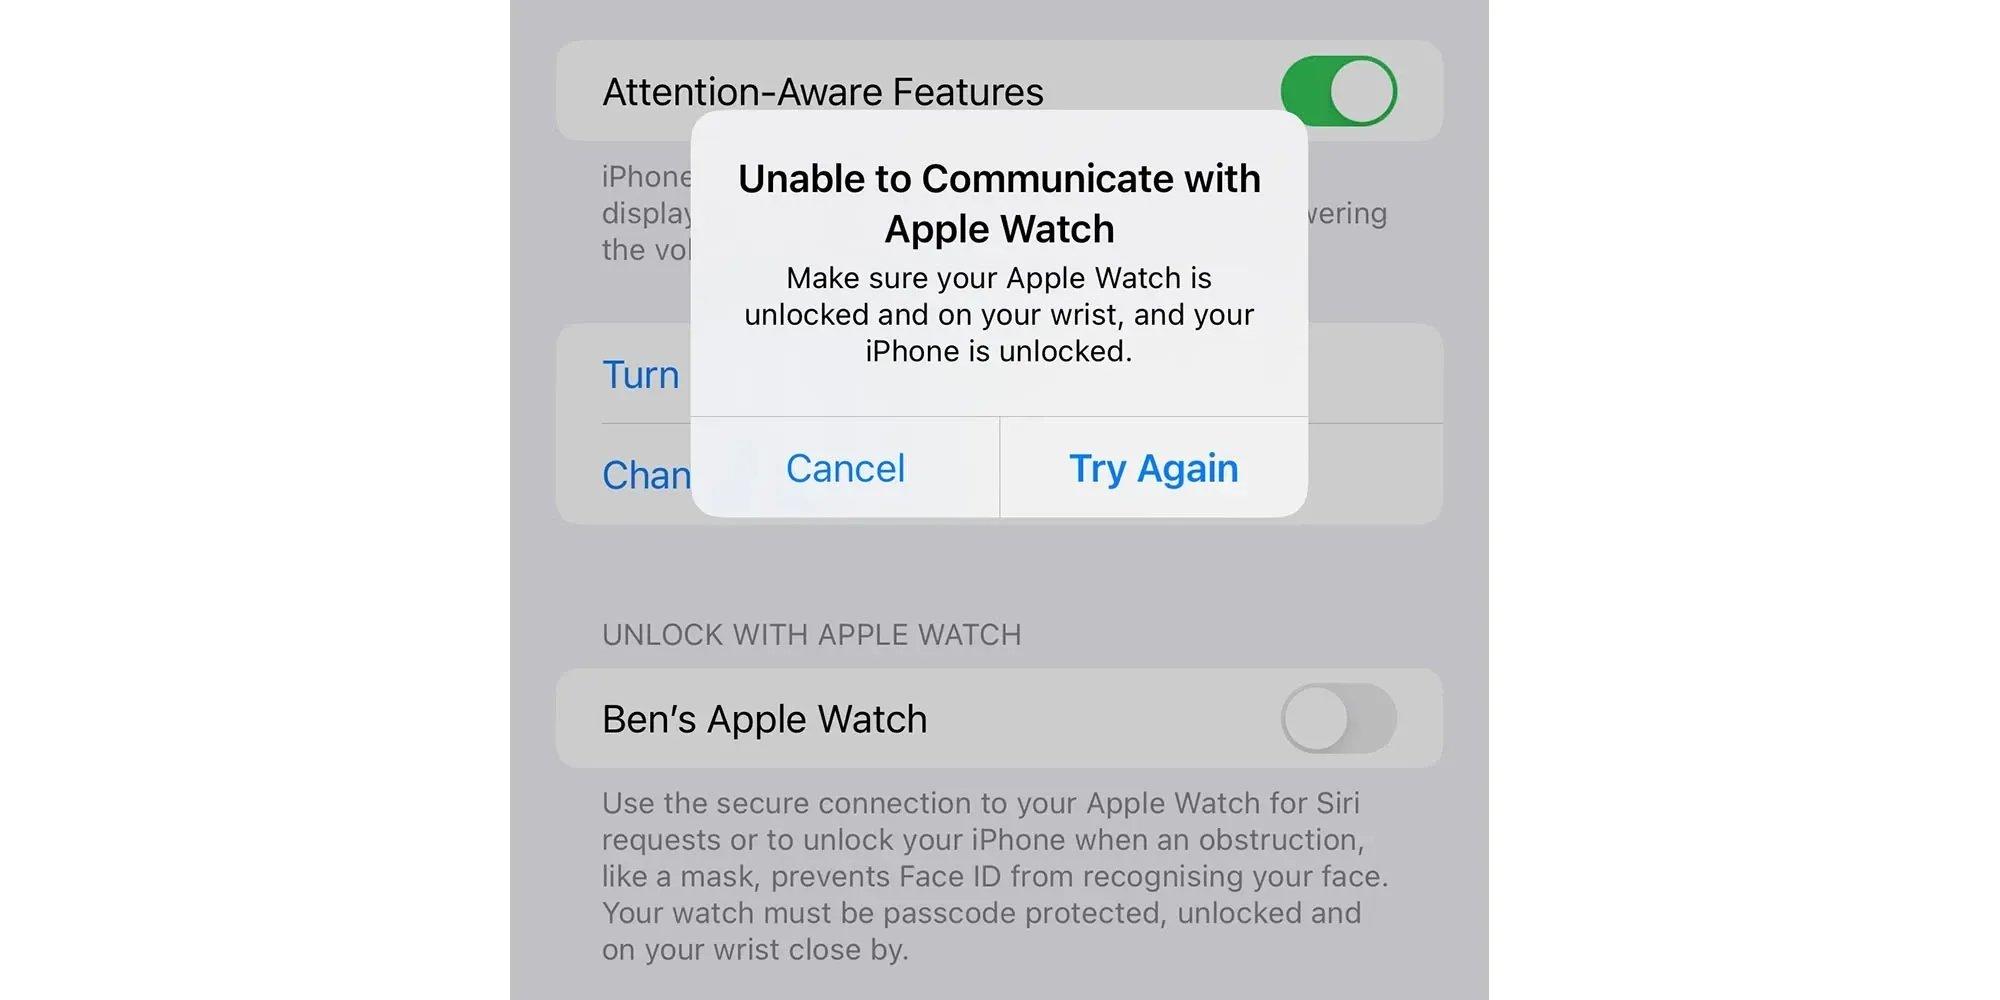 mensagem de erro que surge no iPhone 13